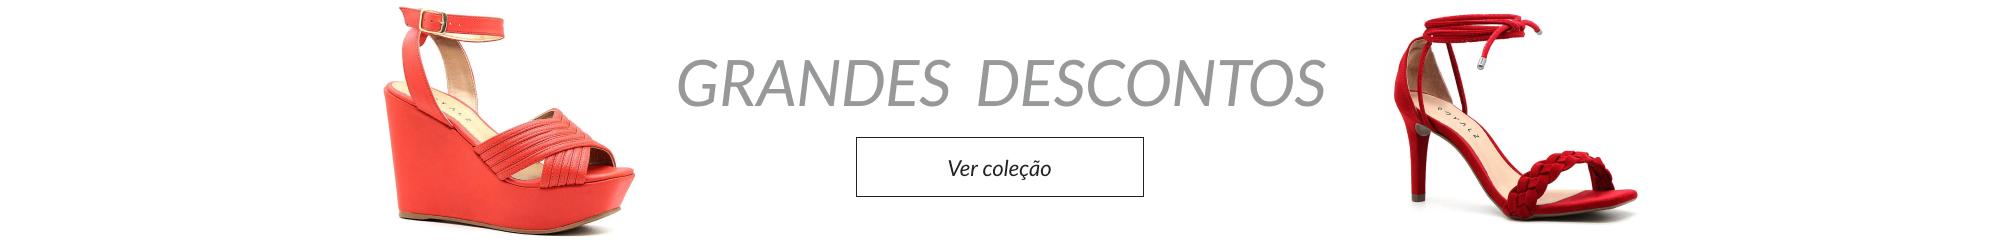 Banner - Desktop